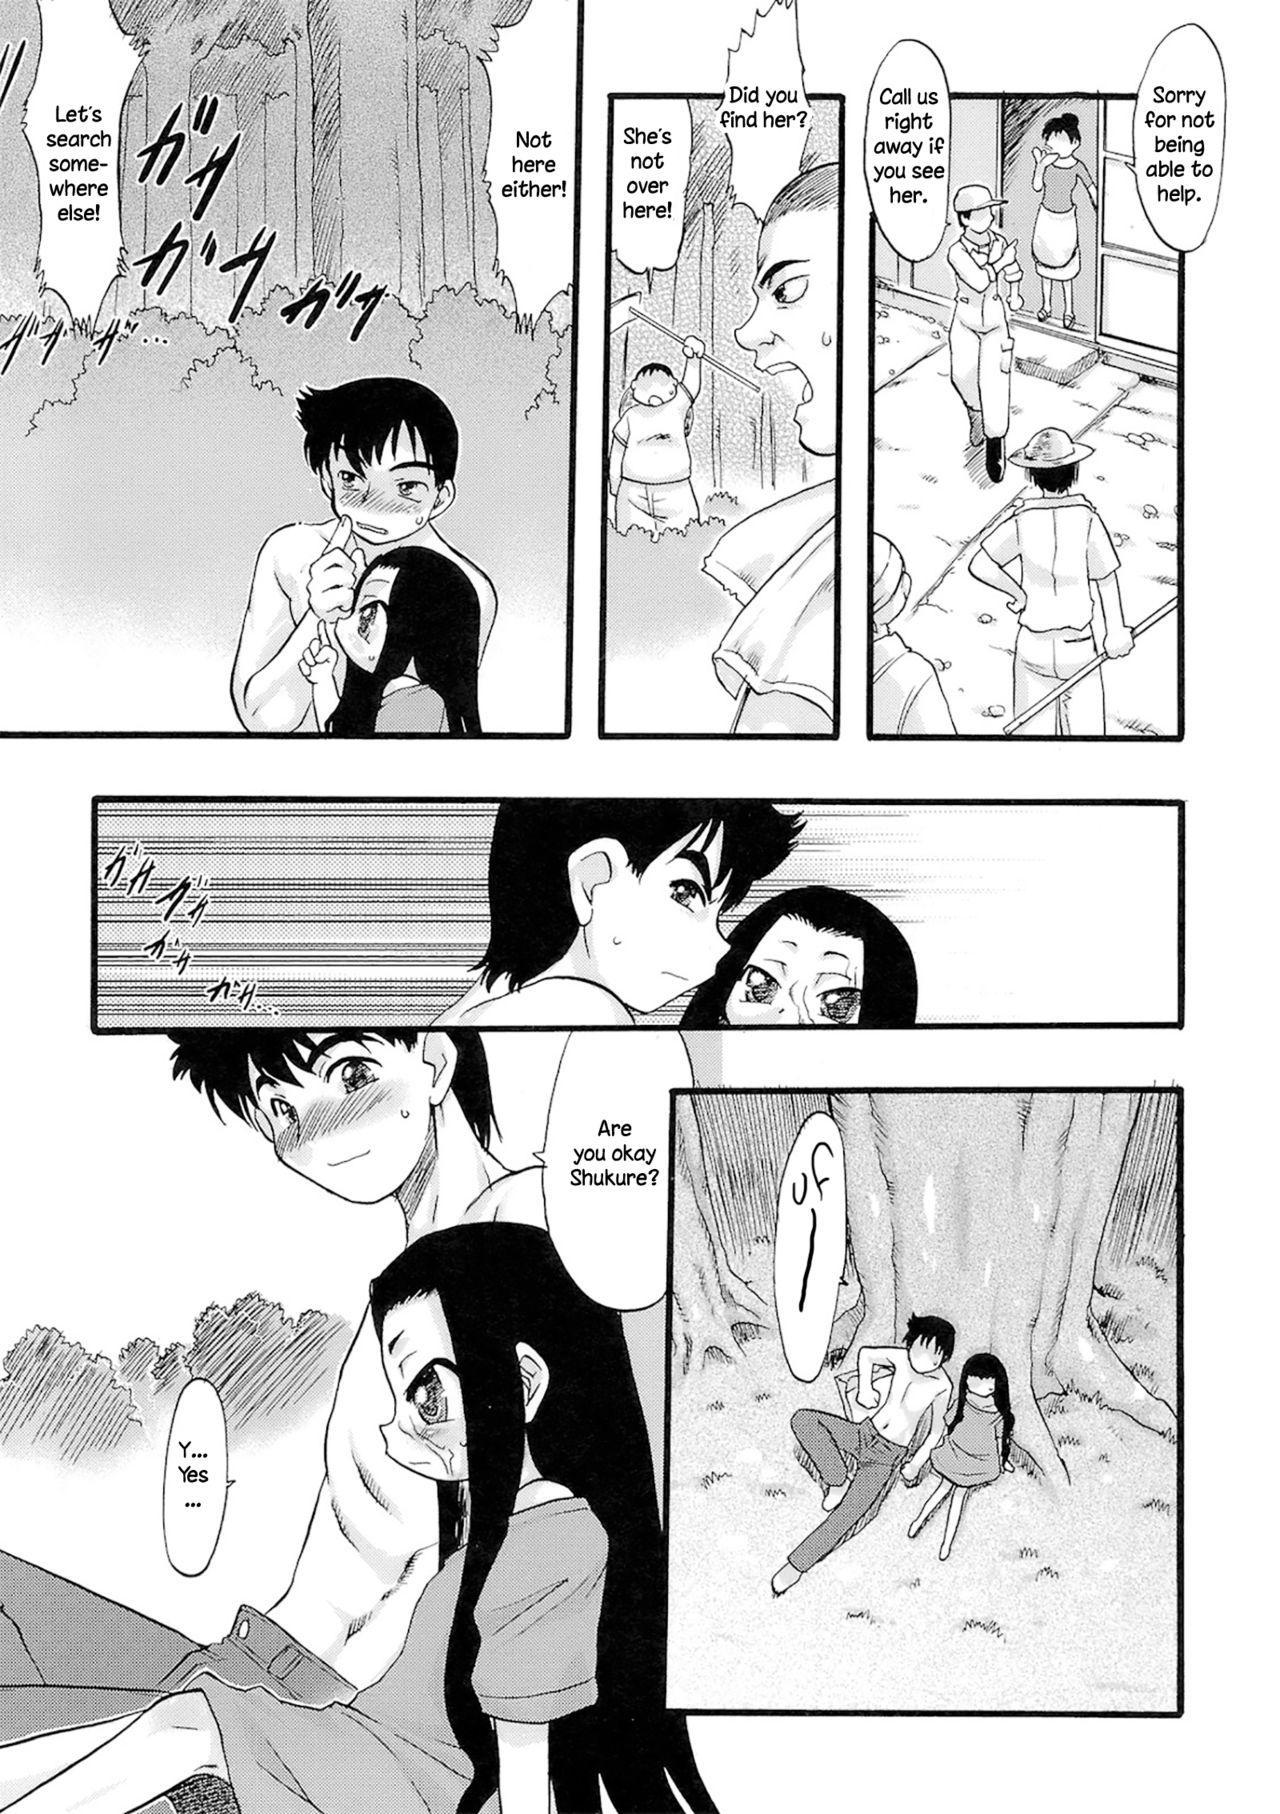 [Teruki Kuma] Osanaki Hana - Kami Haramishi Otome Ch. 1-5.5 [English] [Hige] 40